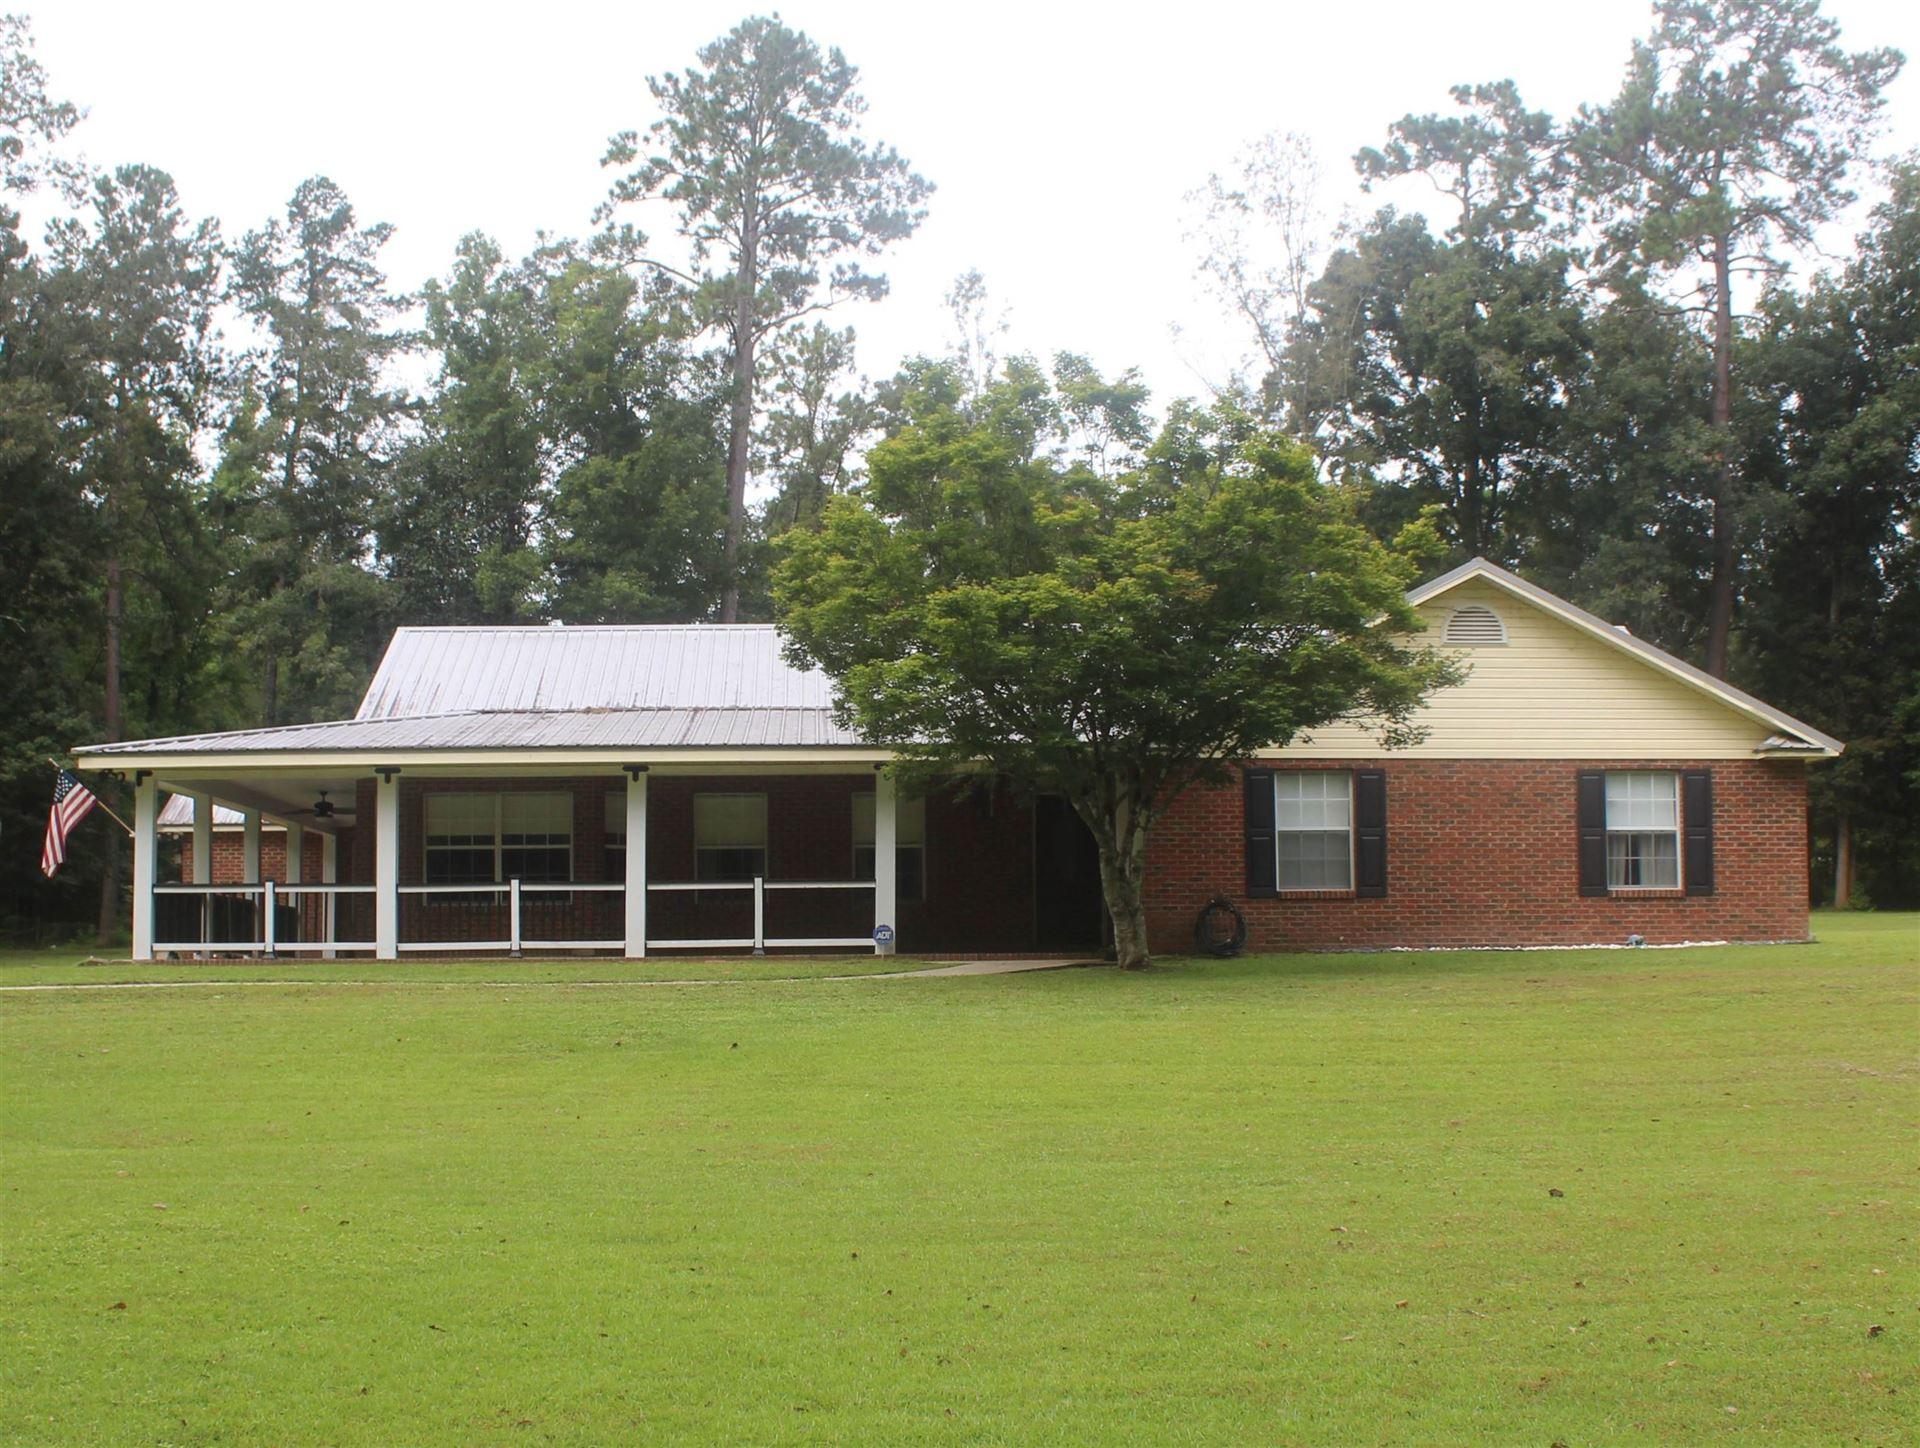 Photo of 3103 Beaver Creek Dr, HAVANA, FL 32333 (MLS # 336453)